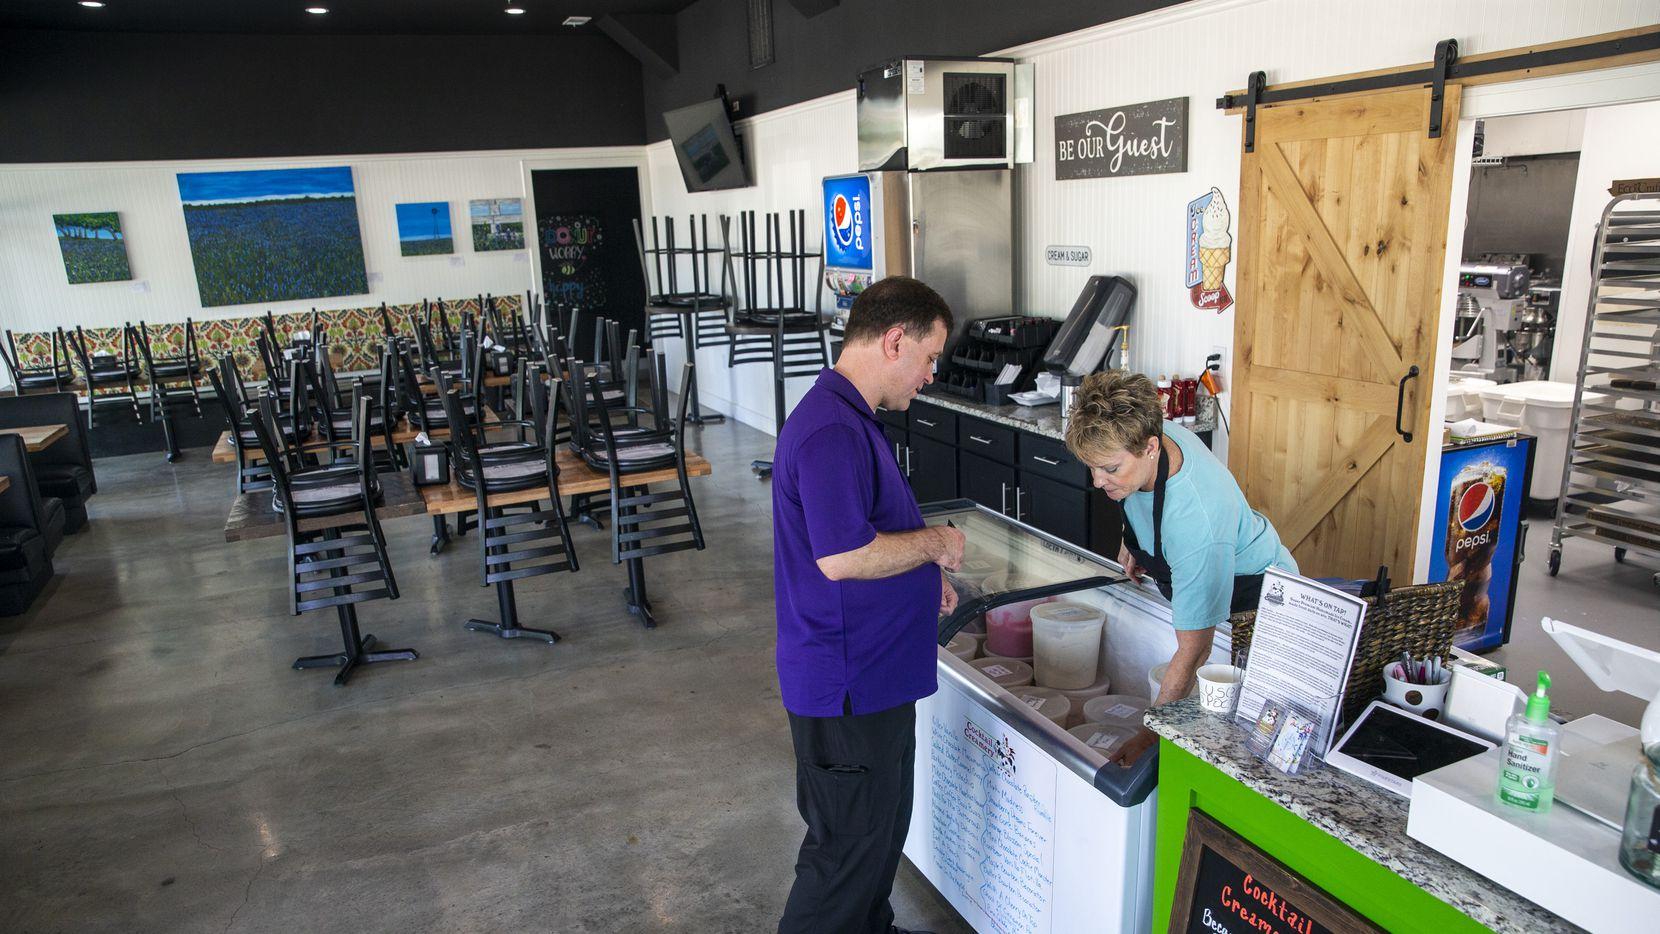 Donut Kitchen employee Julie Davidson (right) helped McKinney resident Paul Giles choose a sweet treat on Thursday, March 26, 2020.